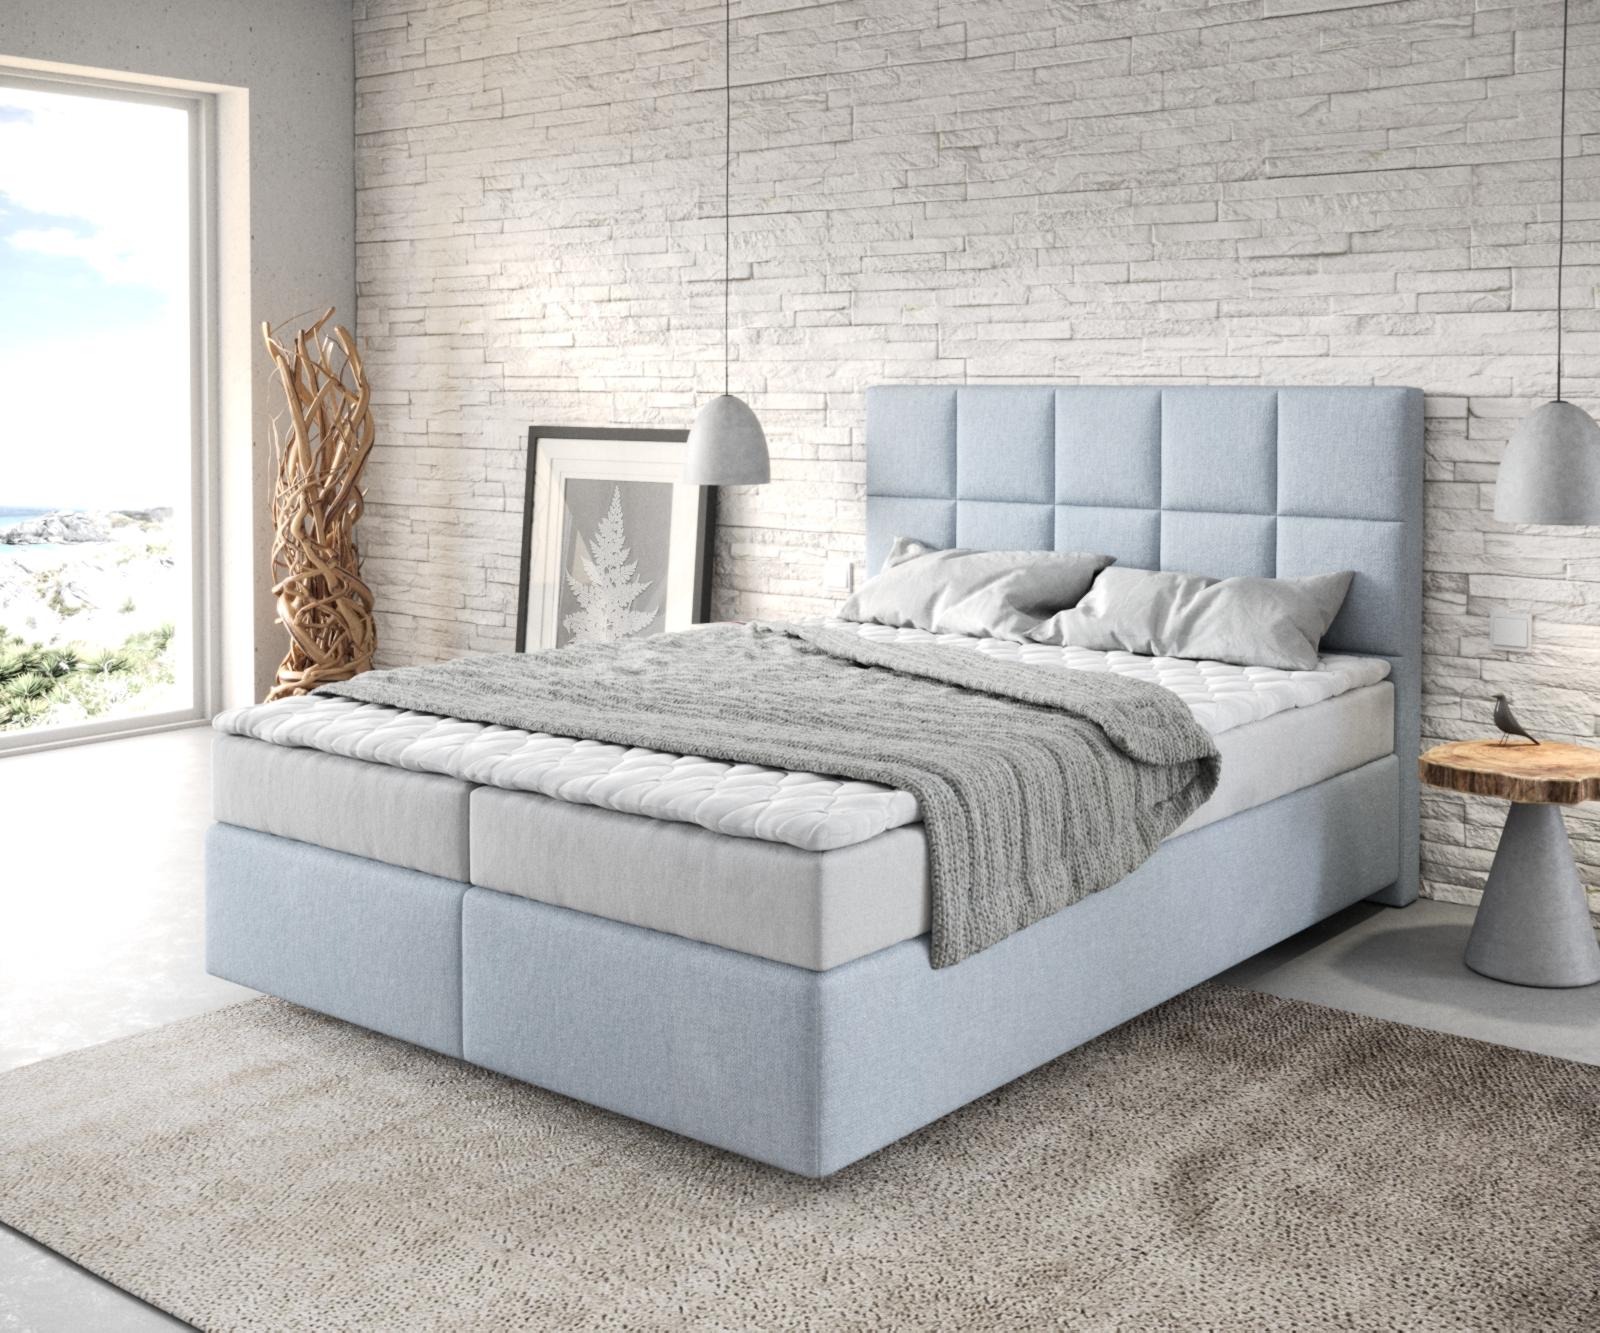 Boxspringbett Dream-Fine 140x200 Flachgewebe Pastellblau